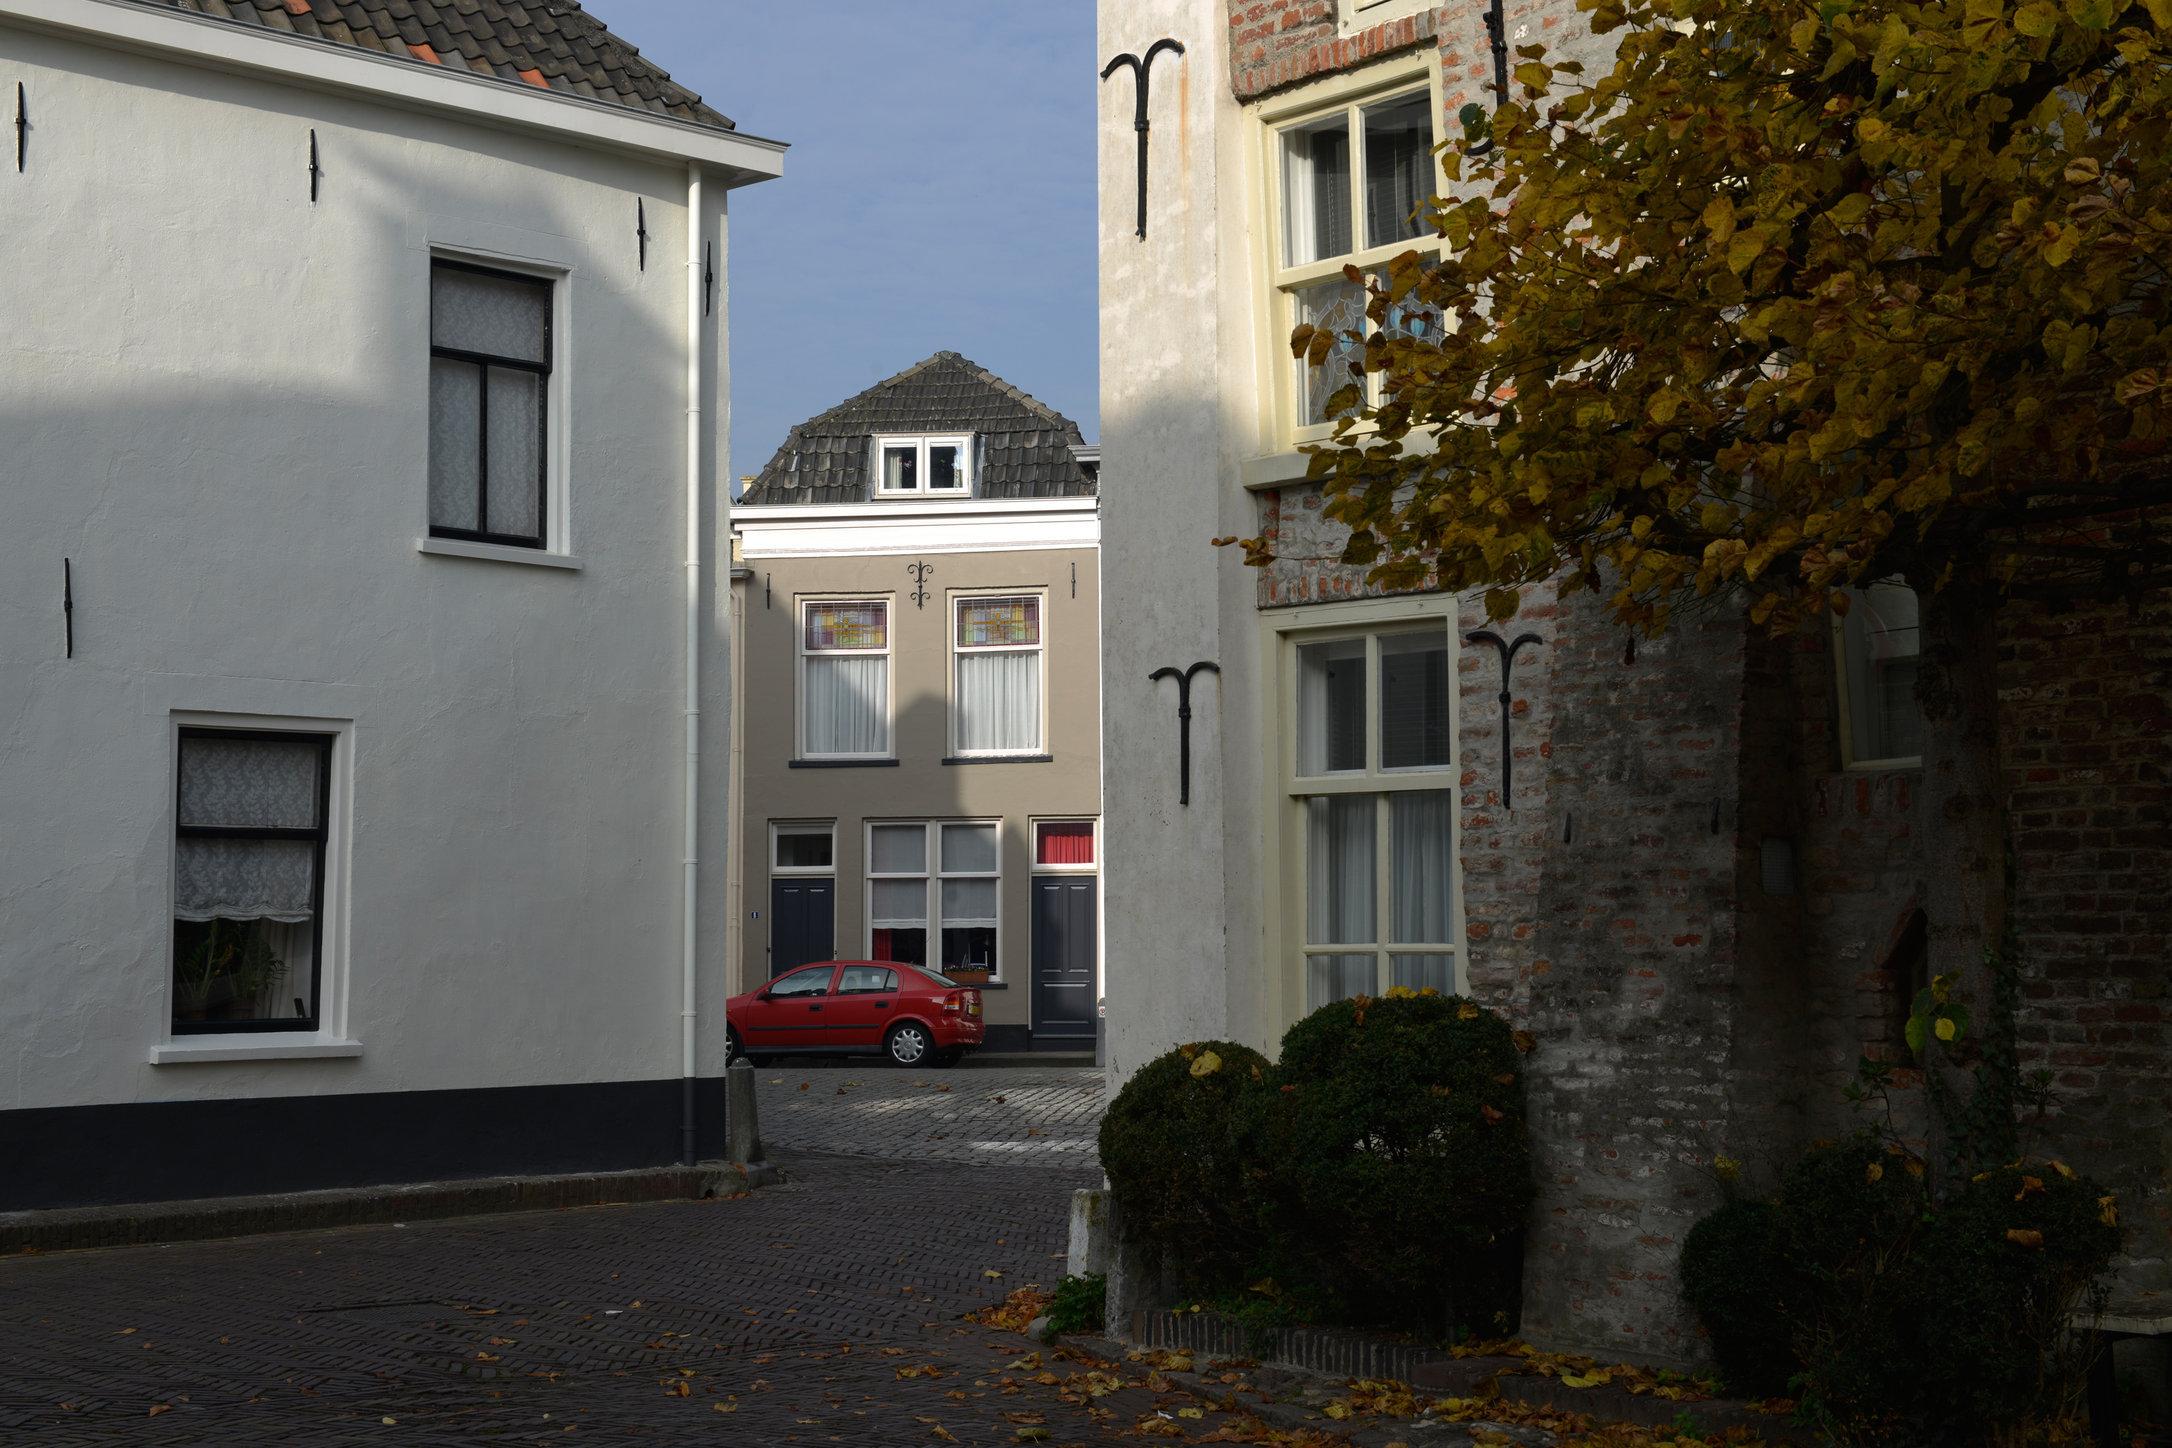 Doesburg (NL)